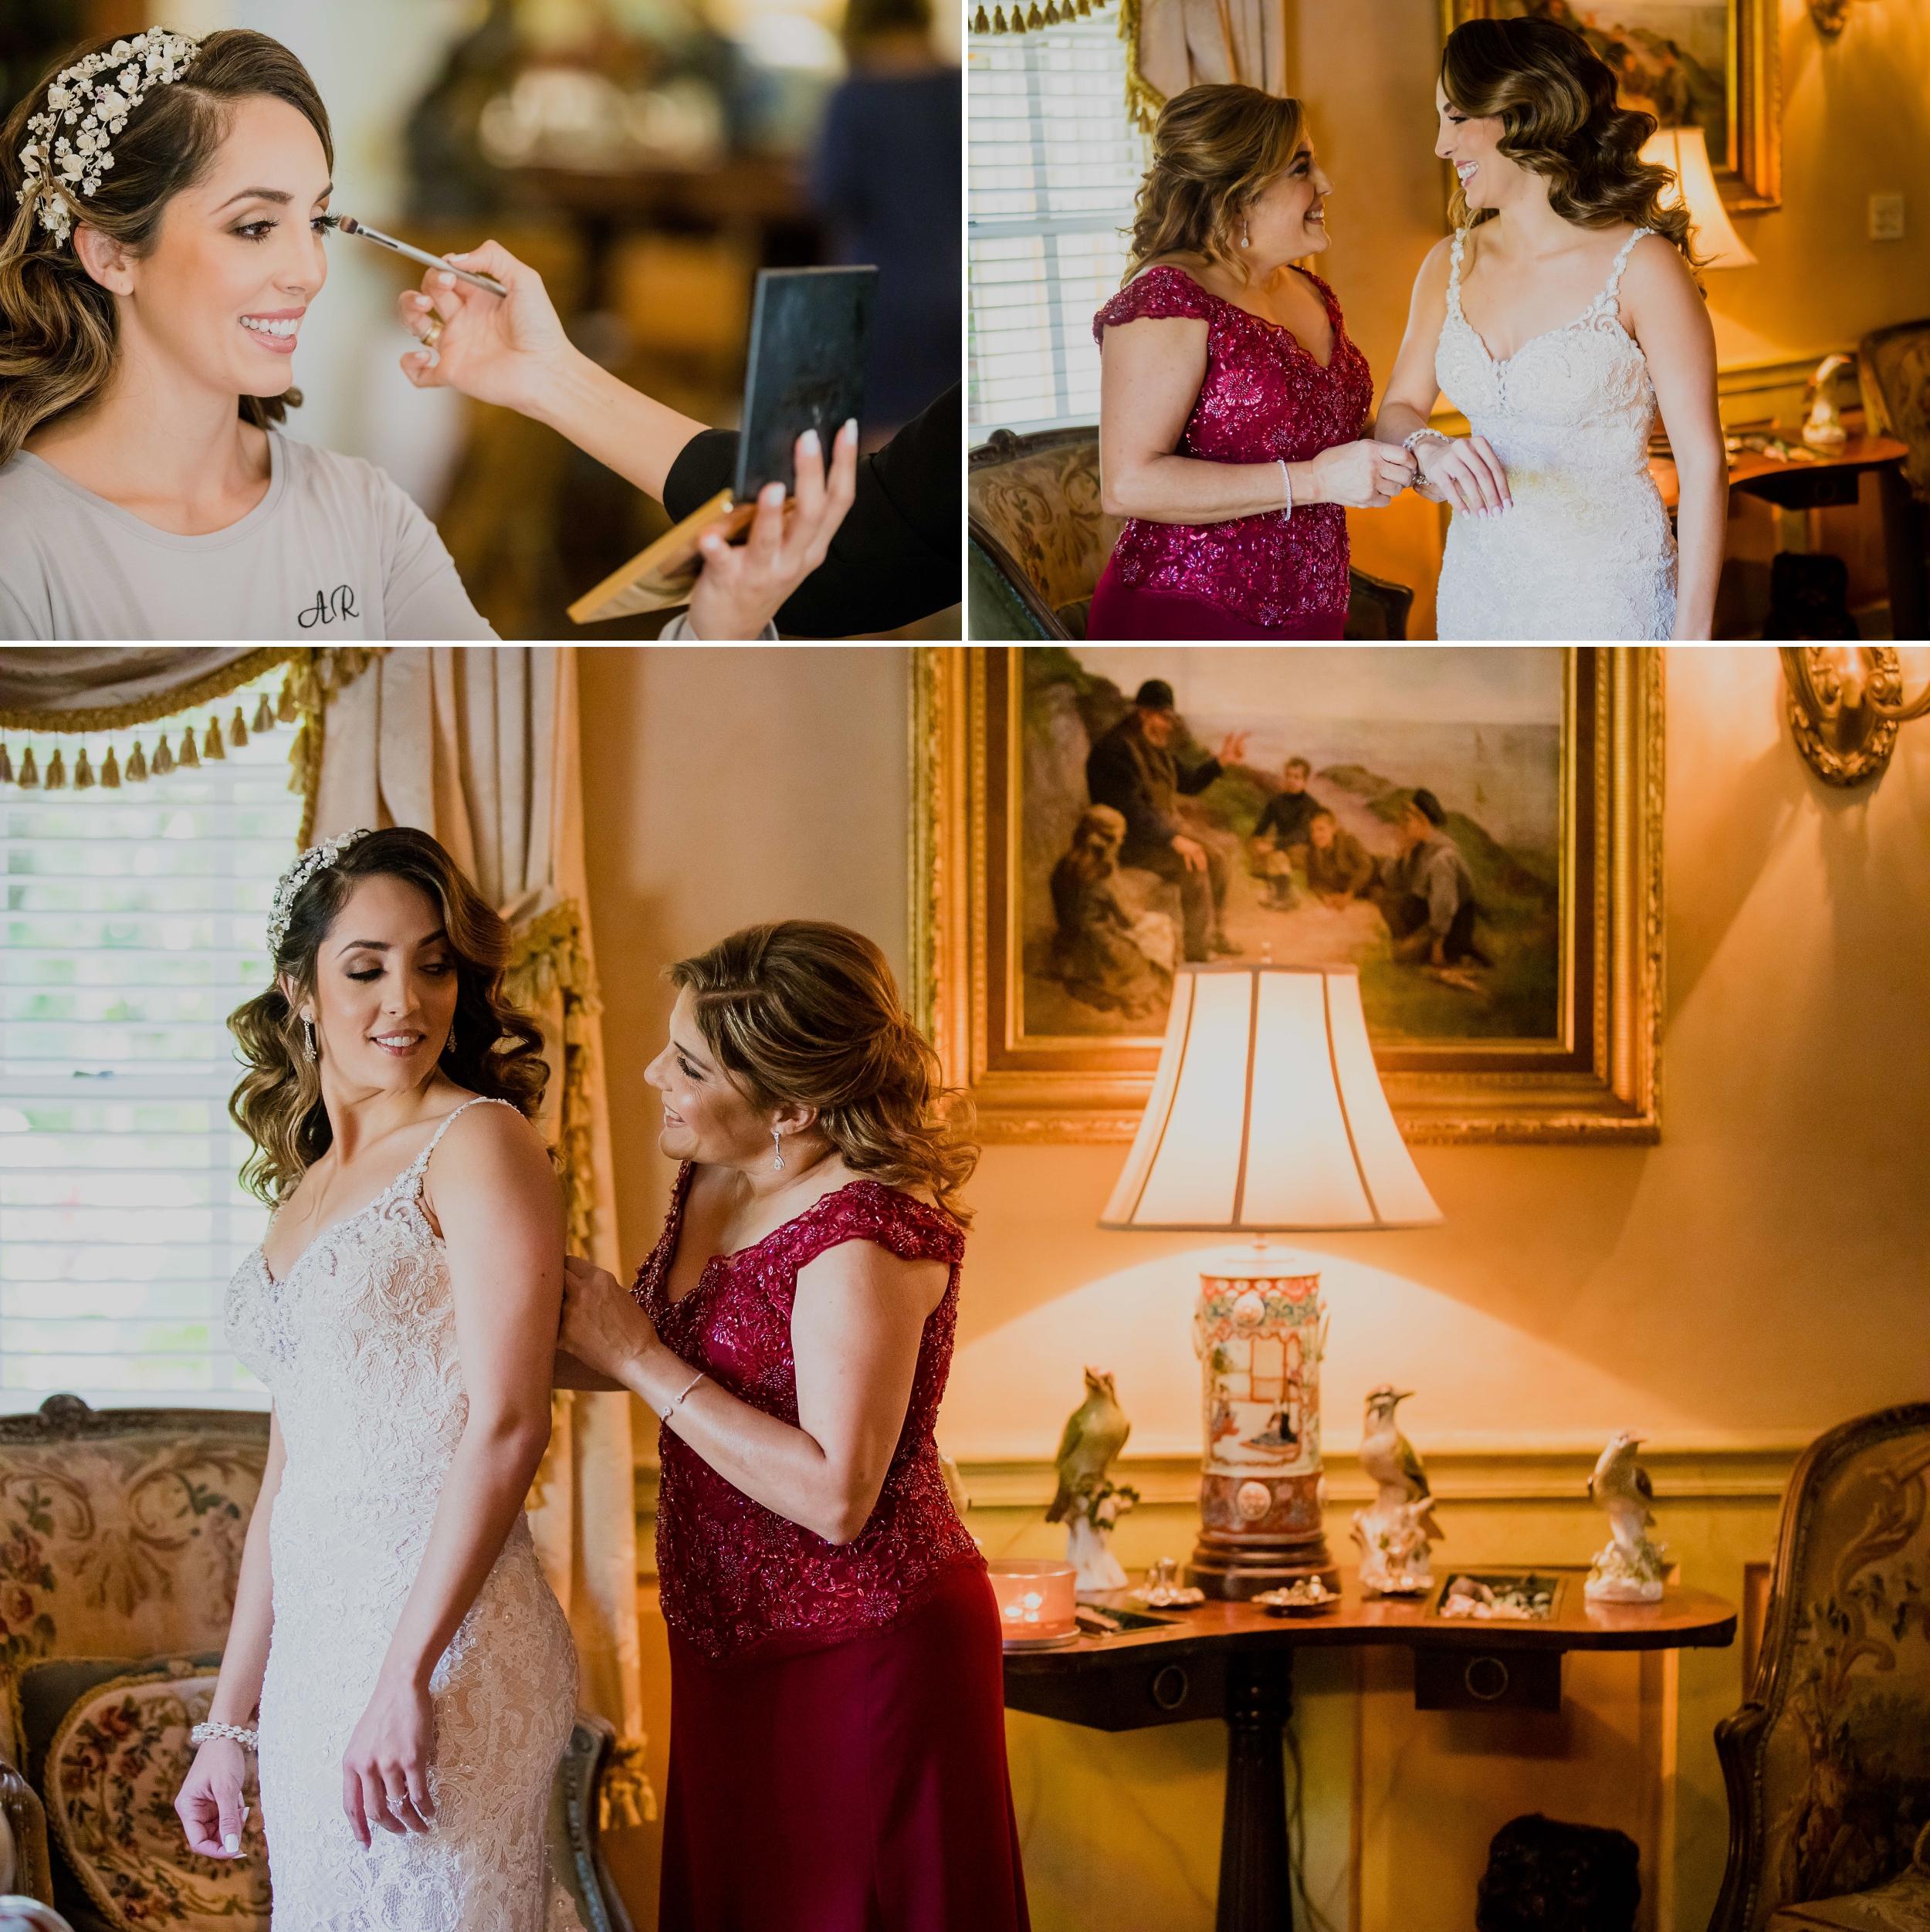 Wedding Miller Plantation Photography by Santy Martinez 2.jpg